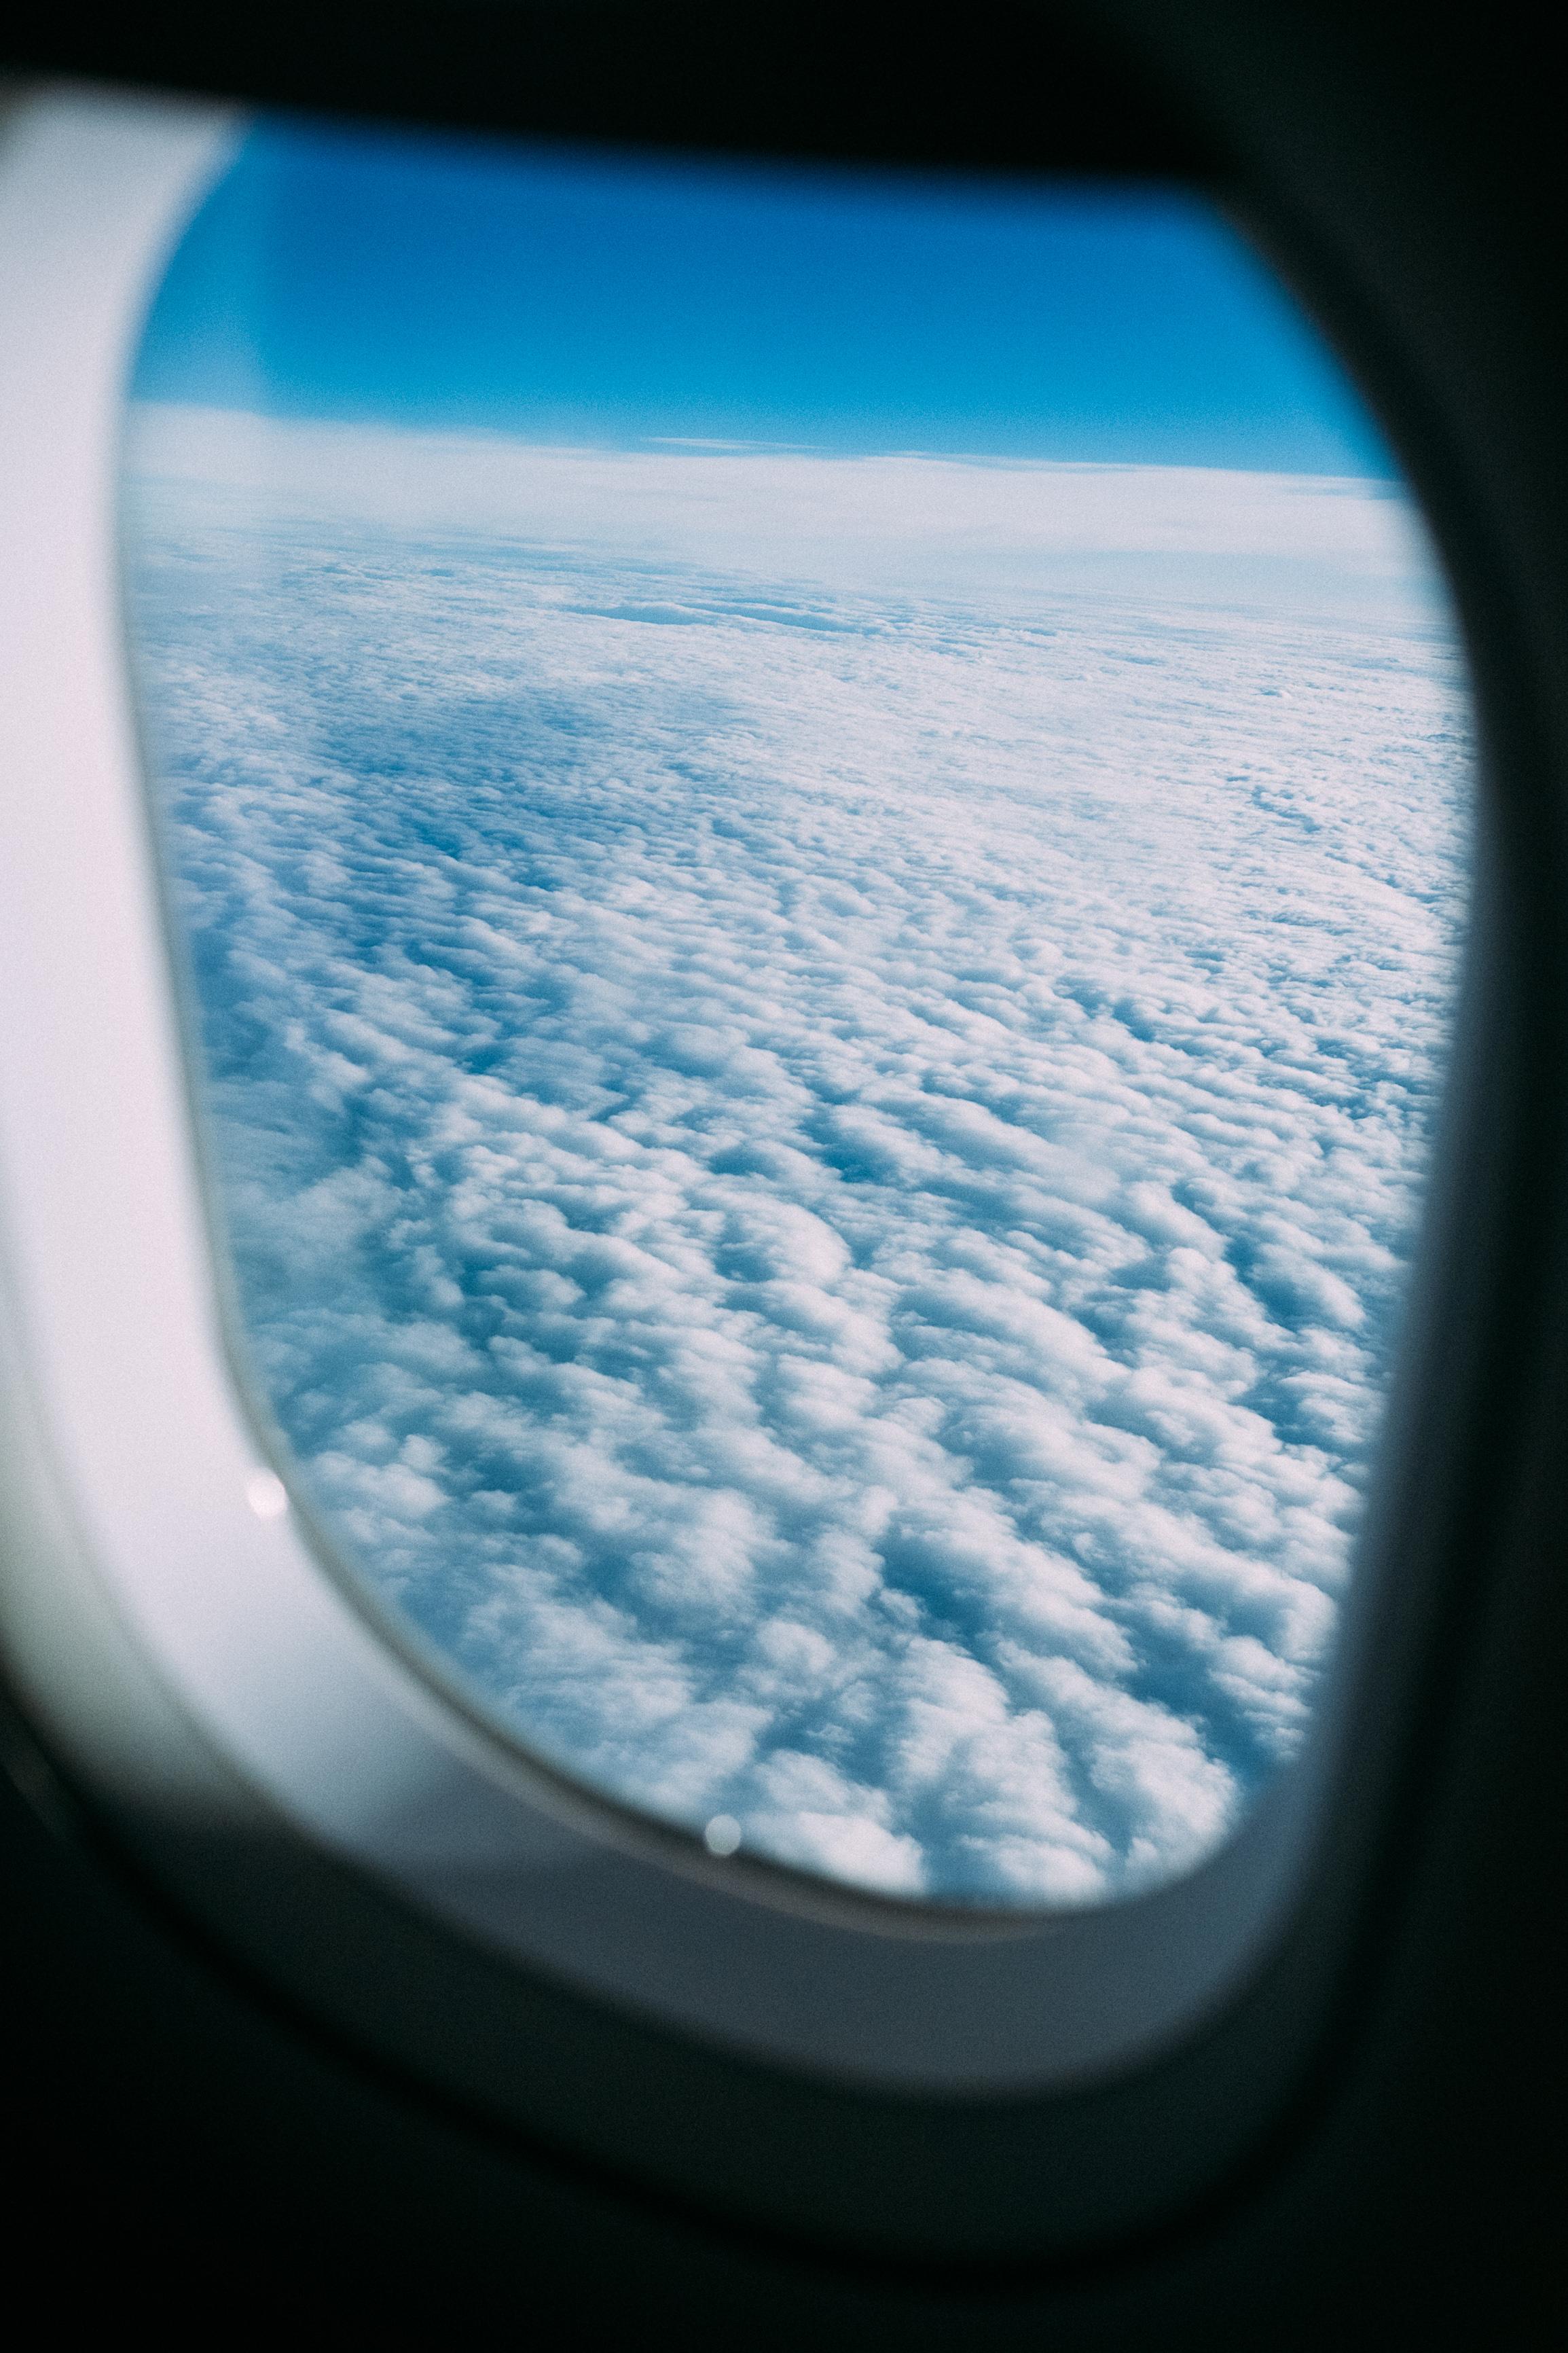 Obligatory airplane window photo.